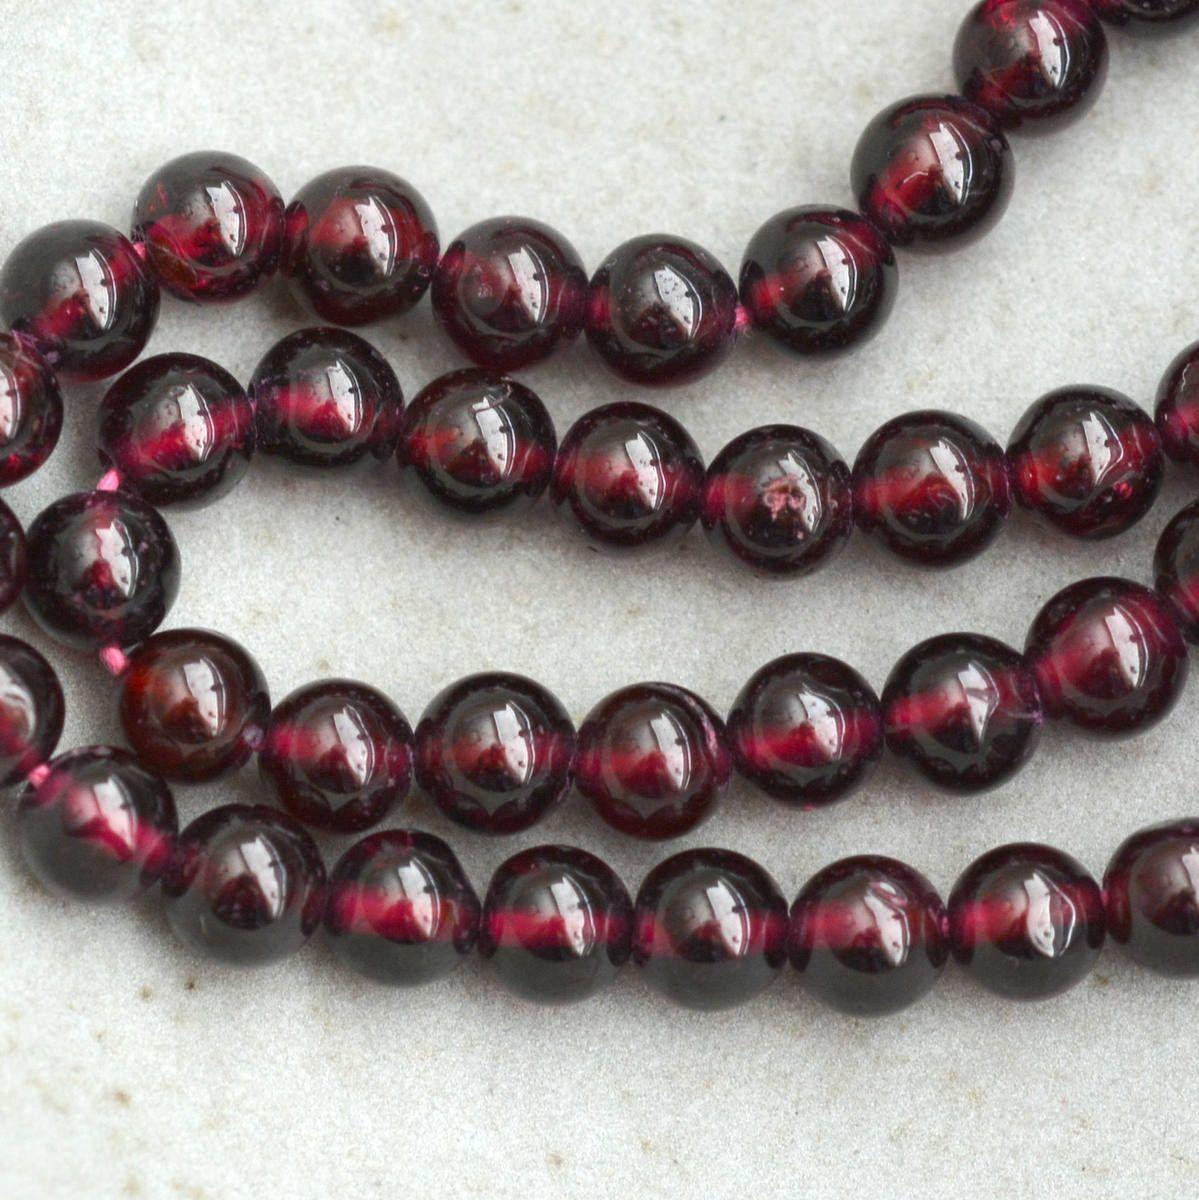 Vintage Design Czech Glass Garnet Red with Silver Heart Beads 17mm x 18mm